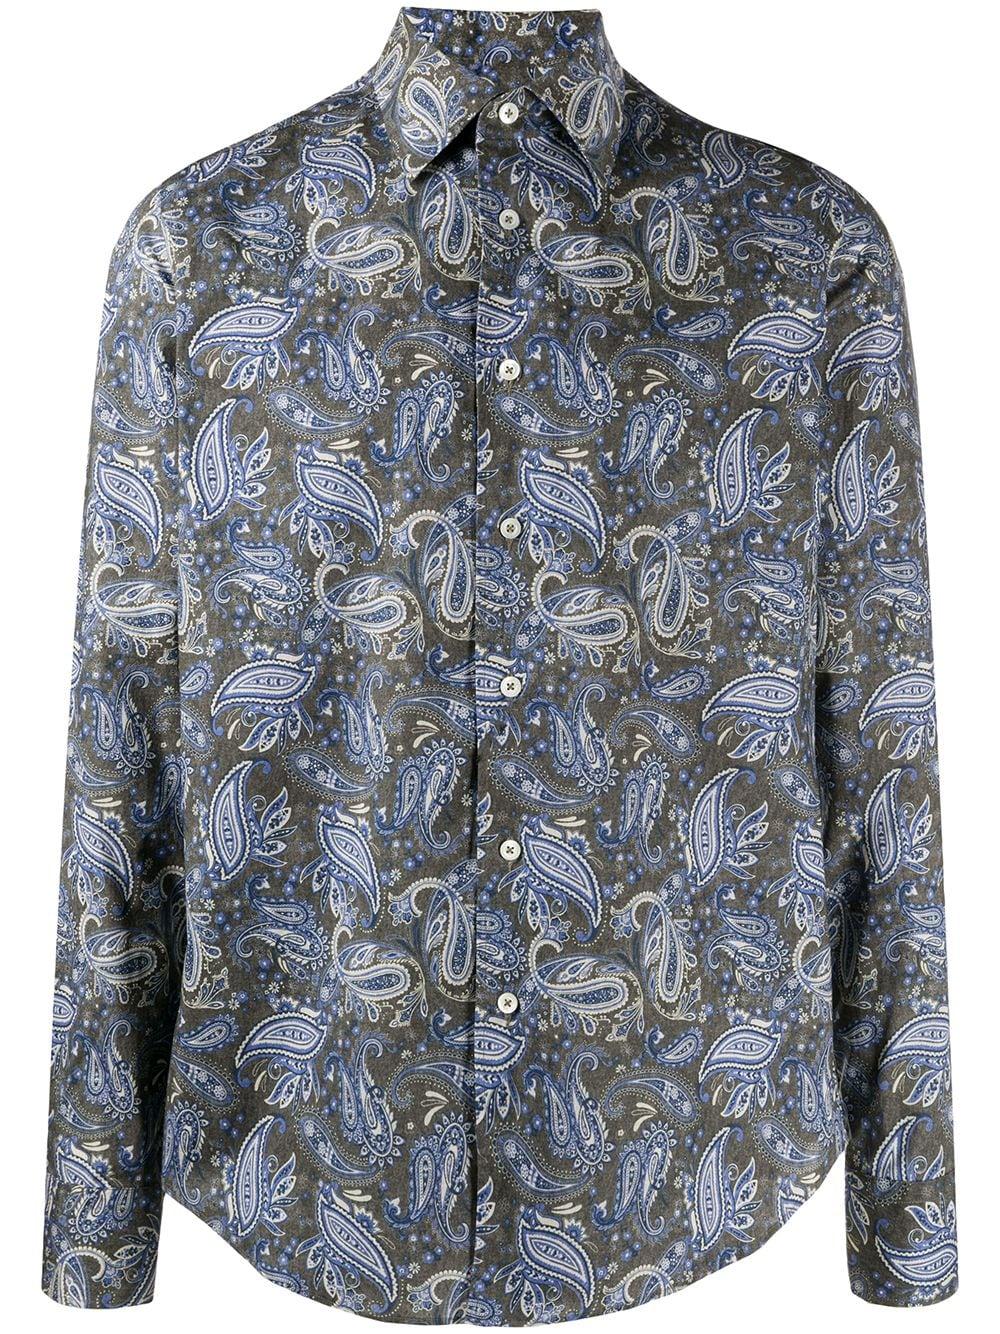 Dell'oglio Overhemd met paisley-print – Blauw